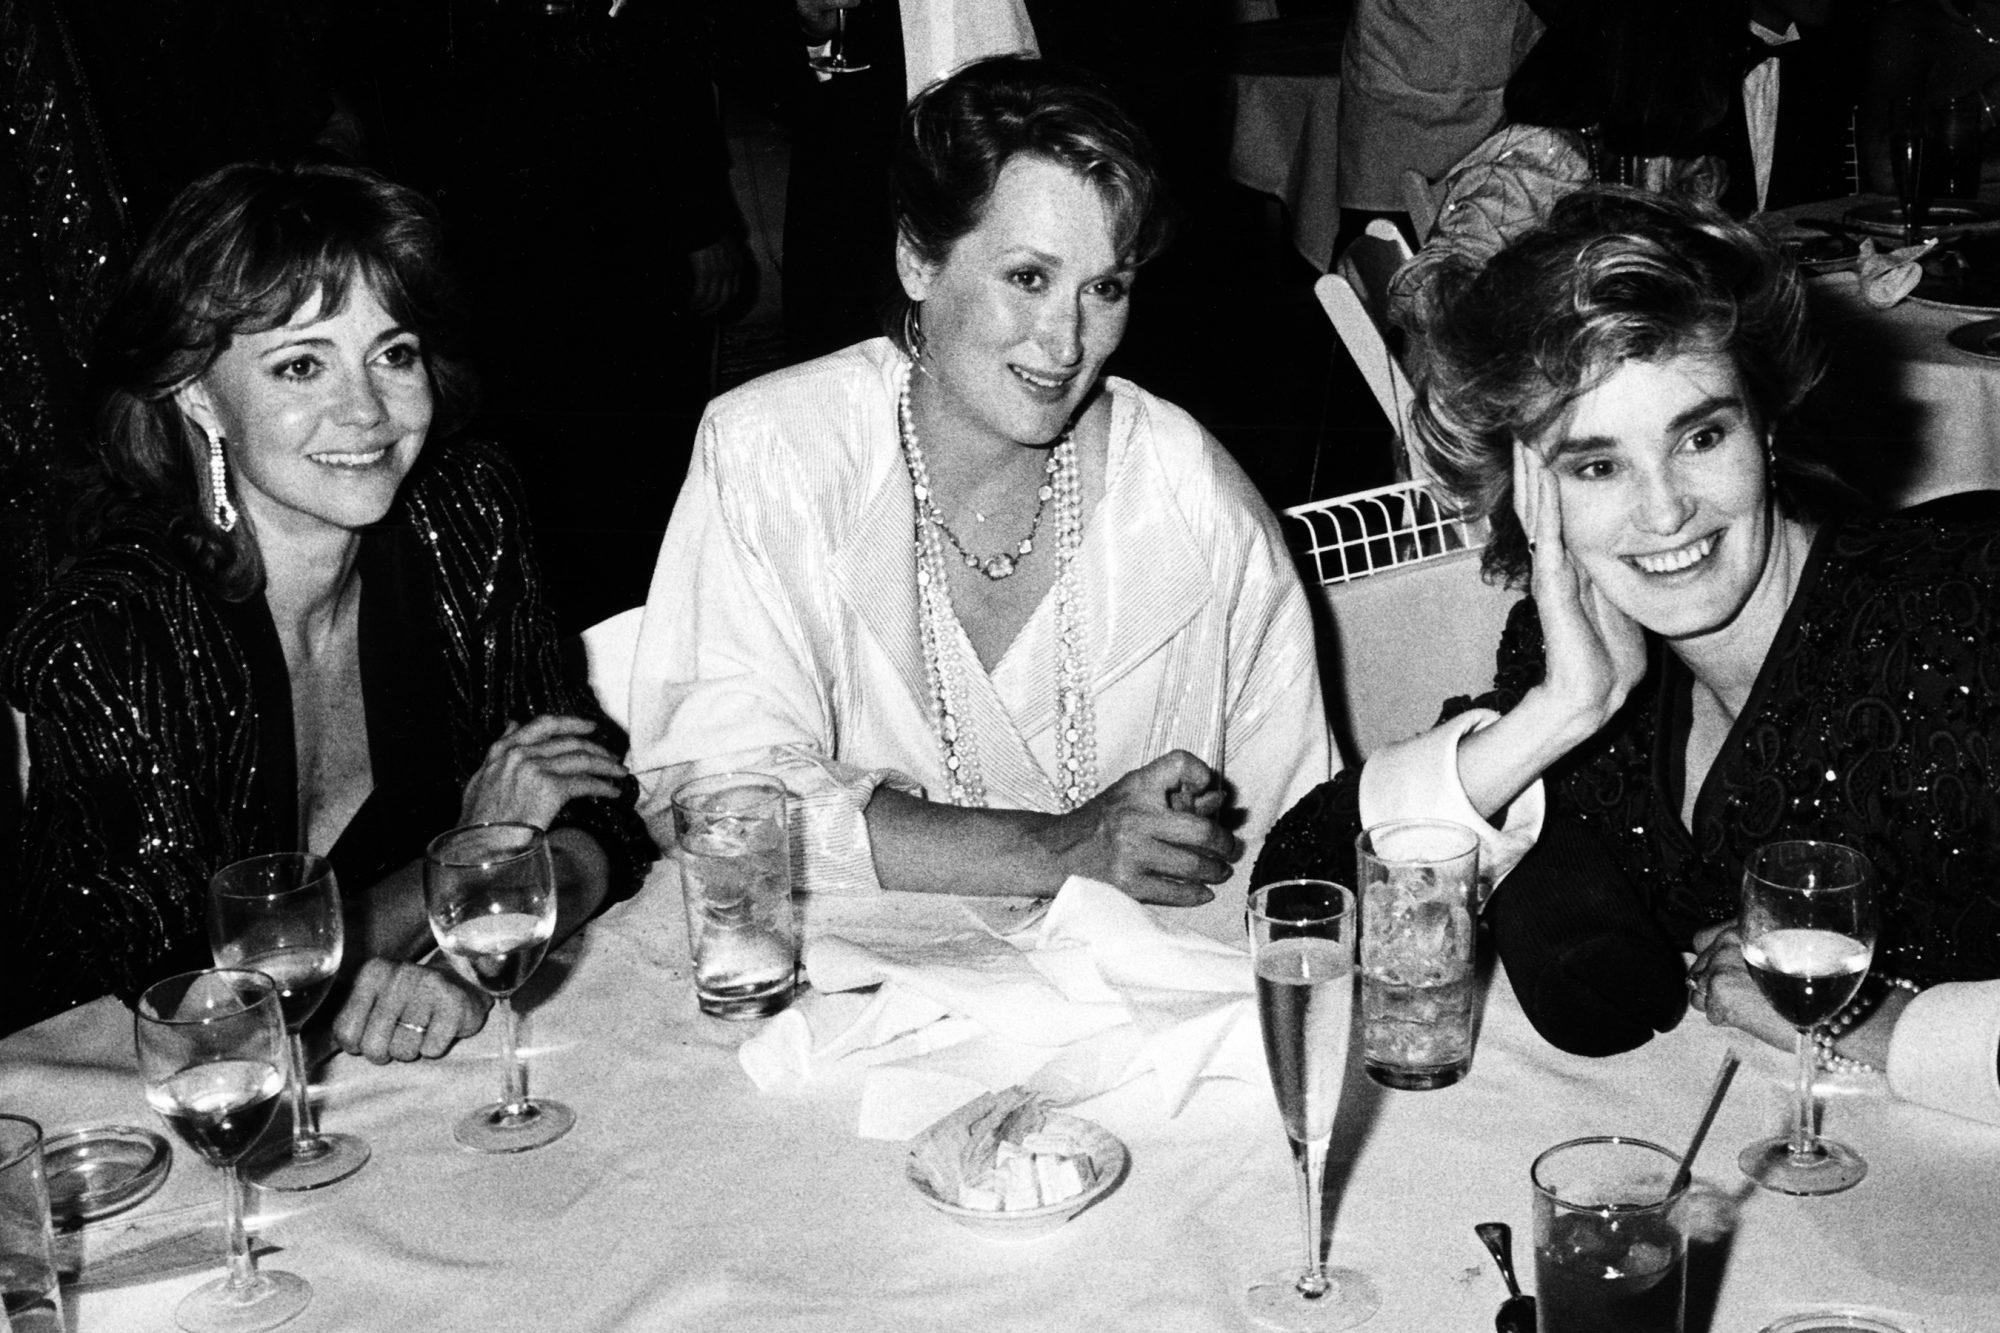 Sally Field, Meryl Streep And Jessica Lange